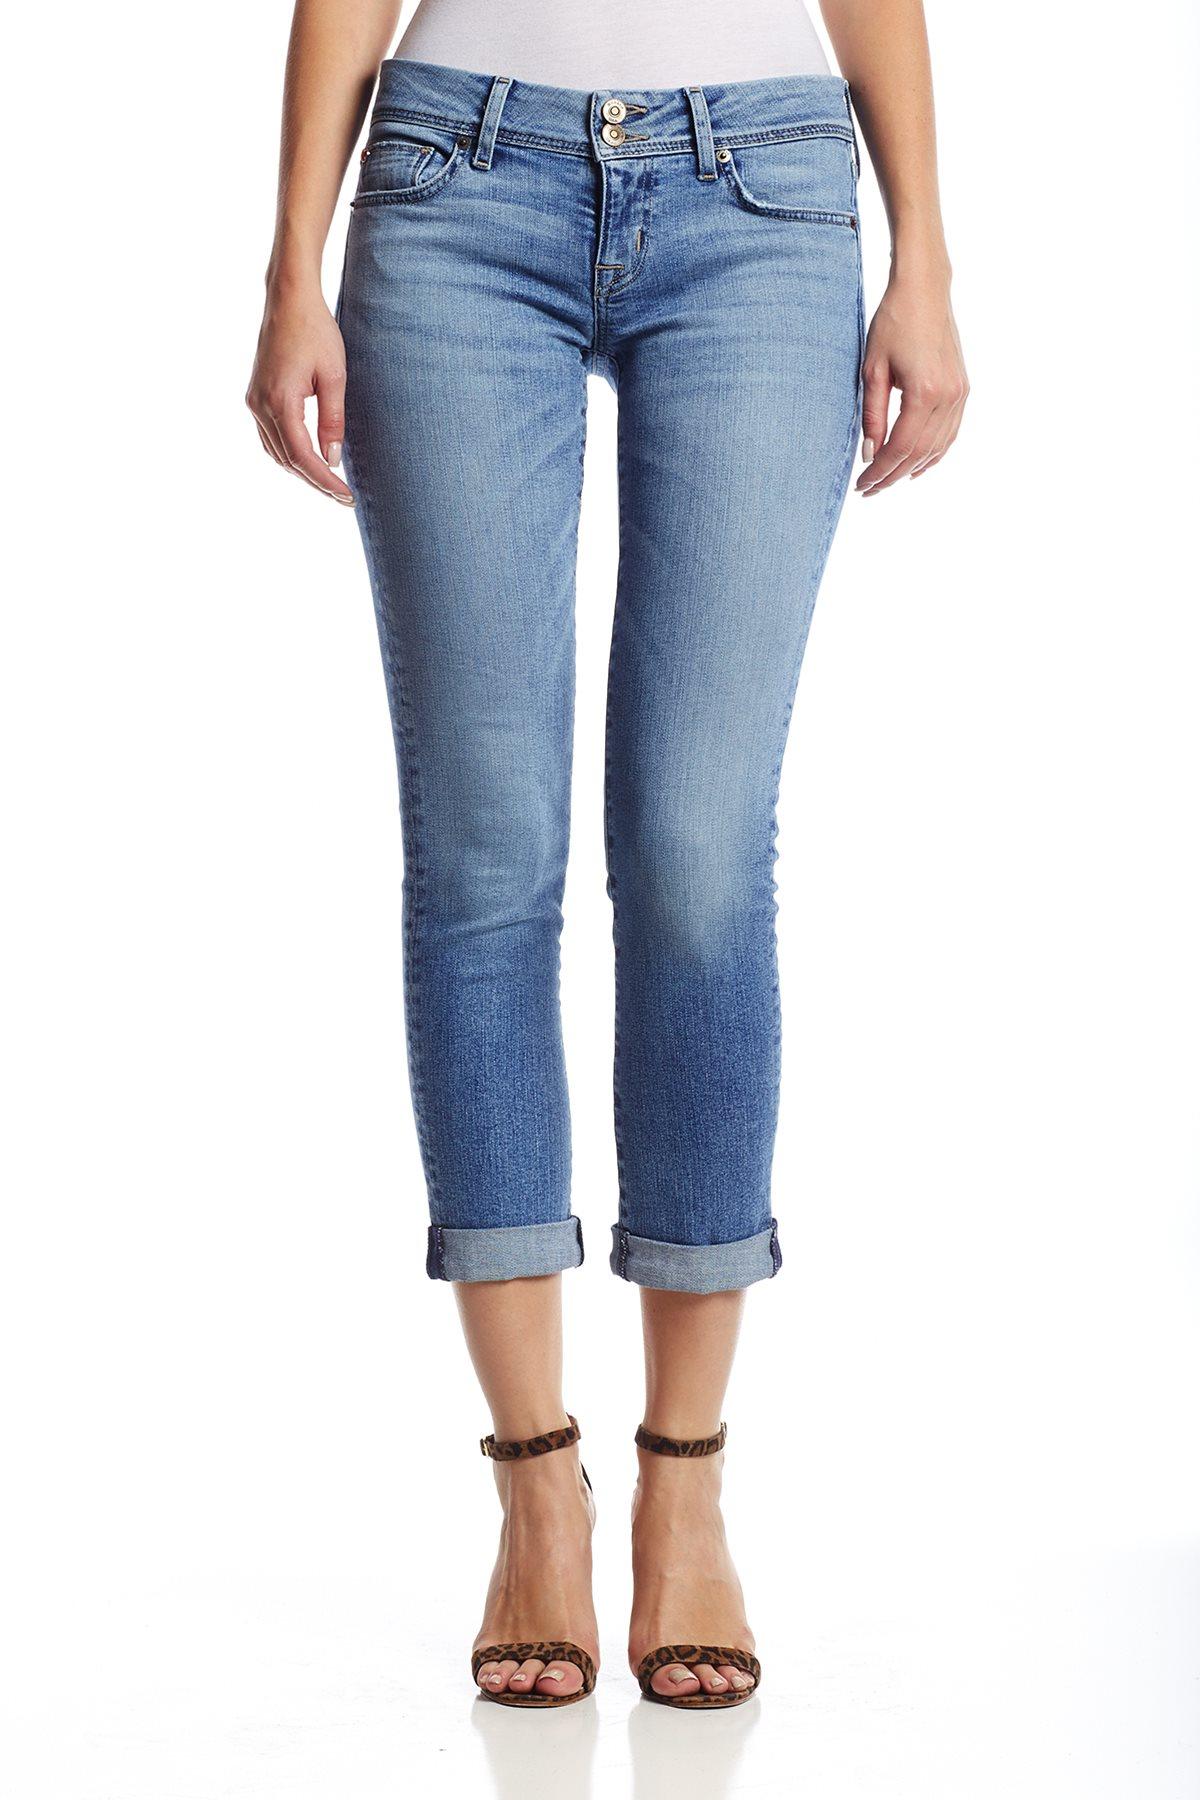 a81020bc4f4 How to Stylishly Wear Cropped Jeans – careyfashion.com